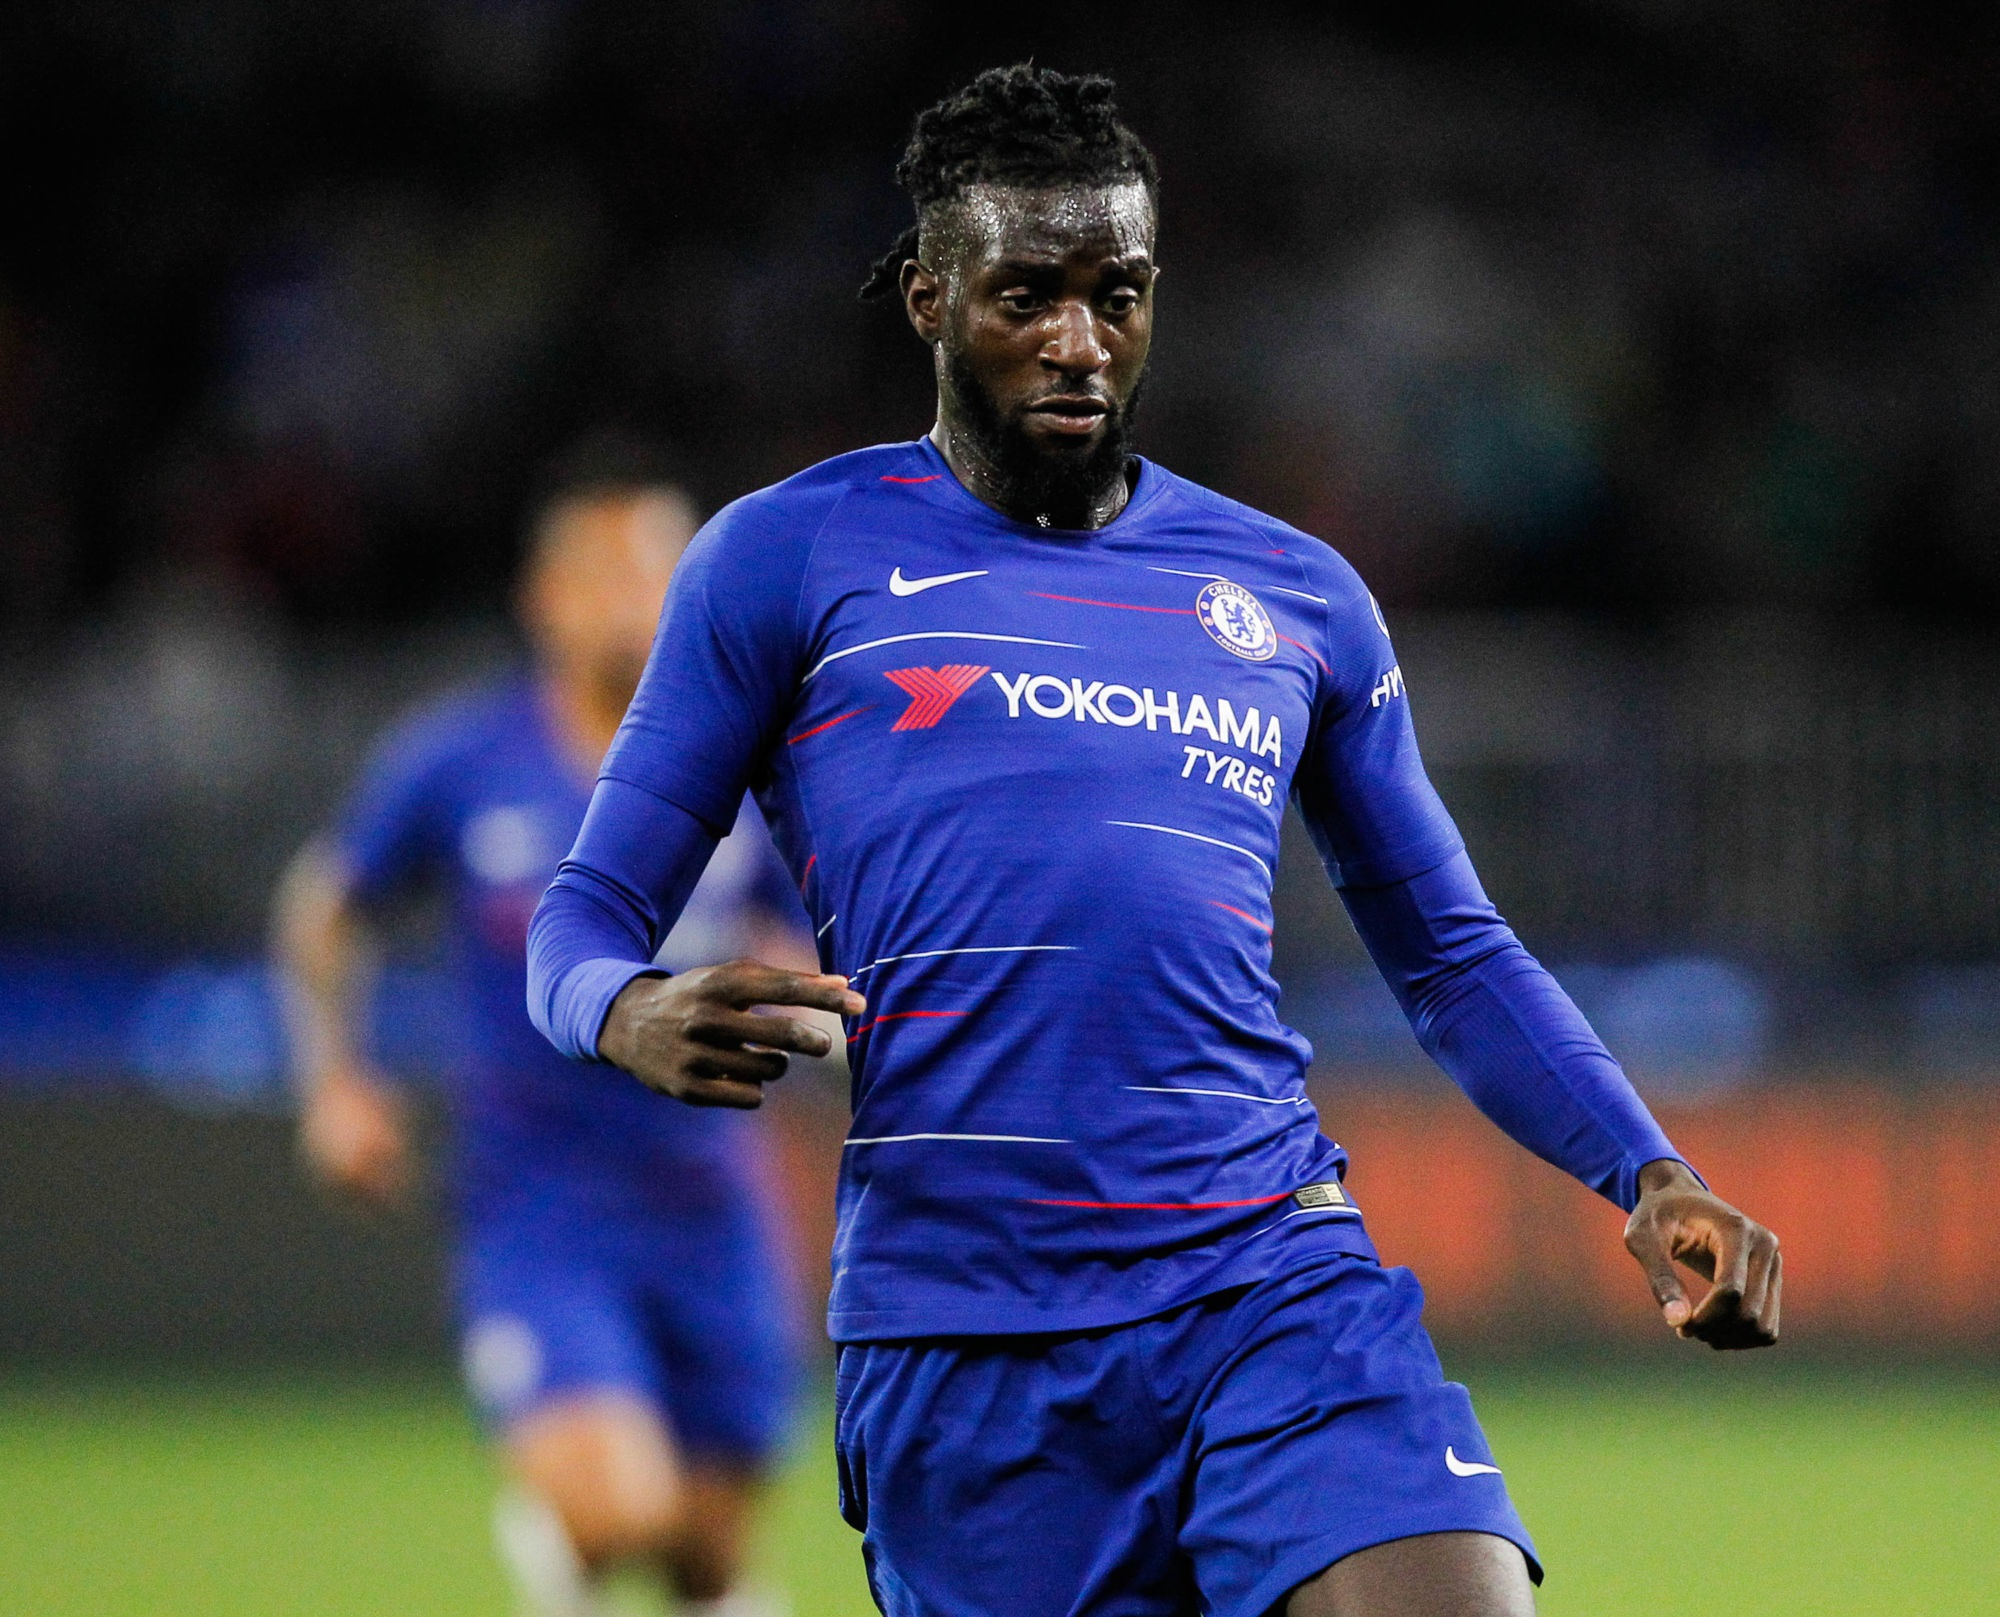 Exclu - Bakayoko, le PSG est proche de l'accord avec Chelsea